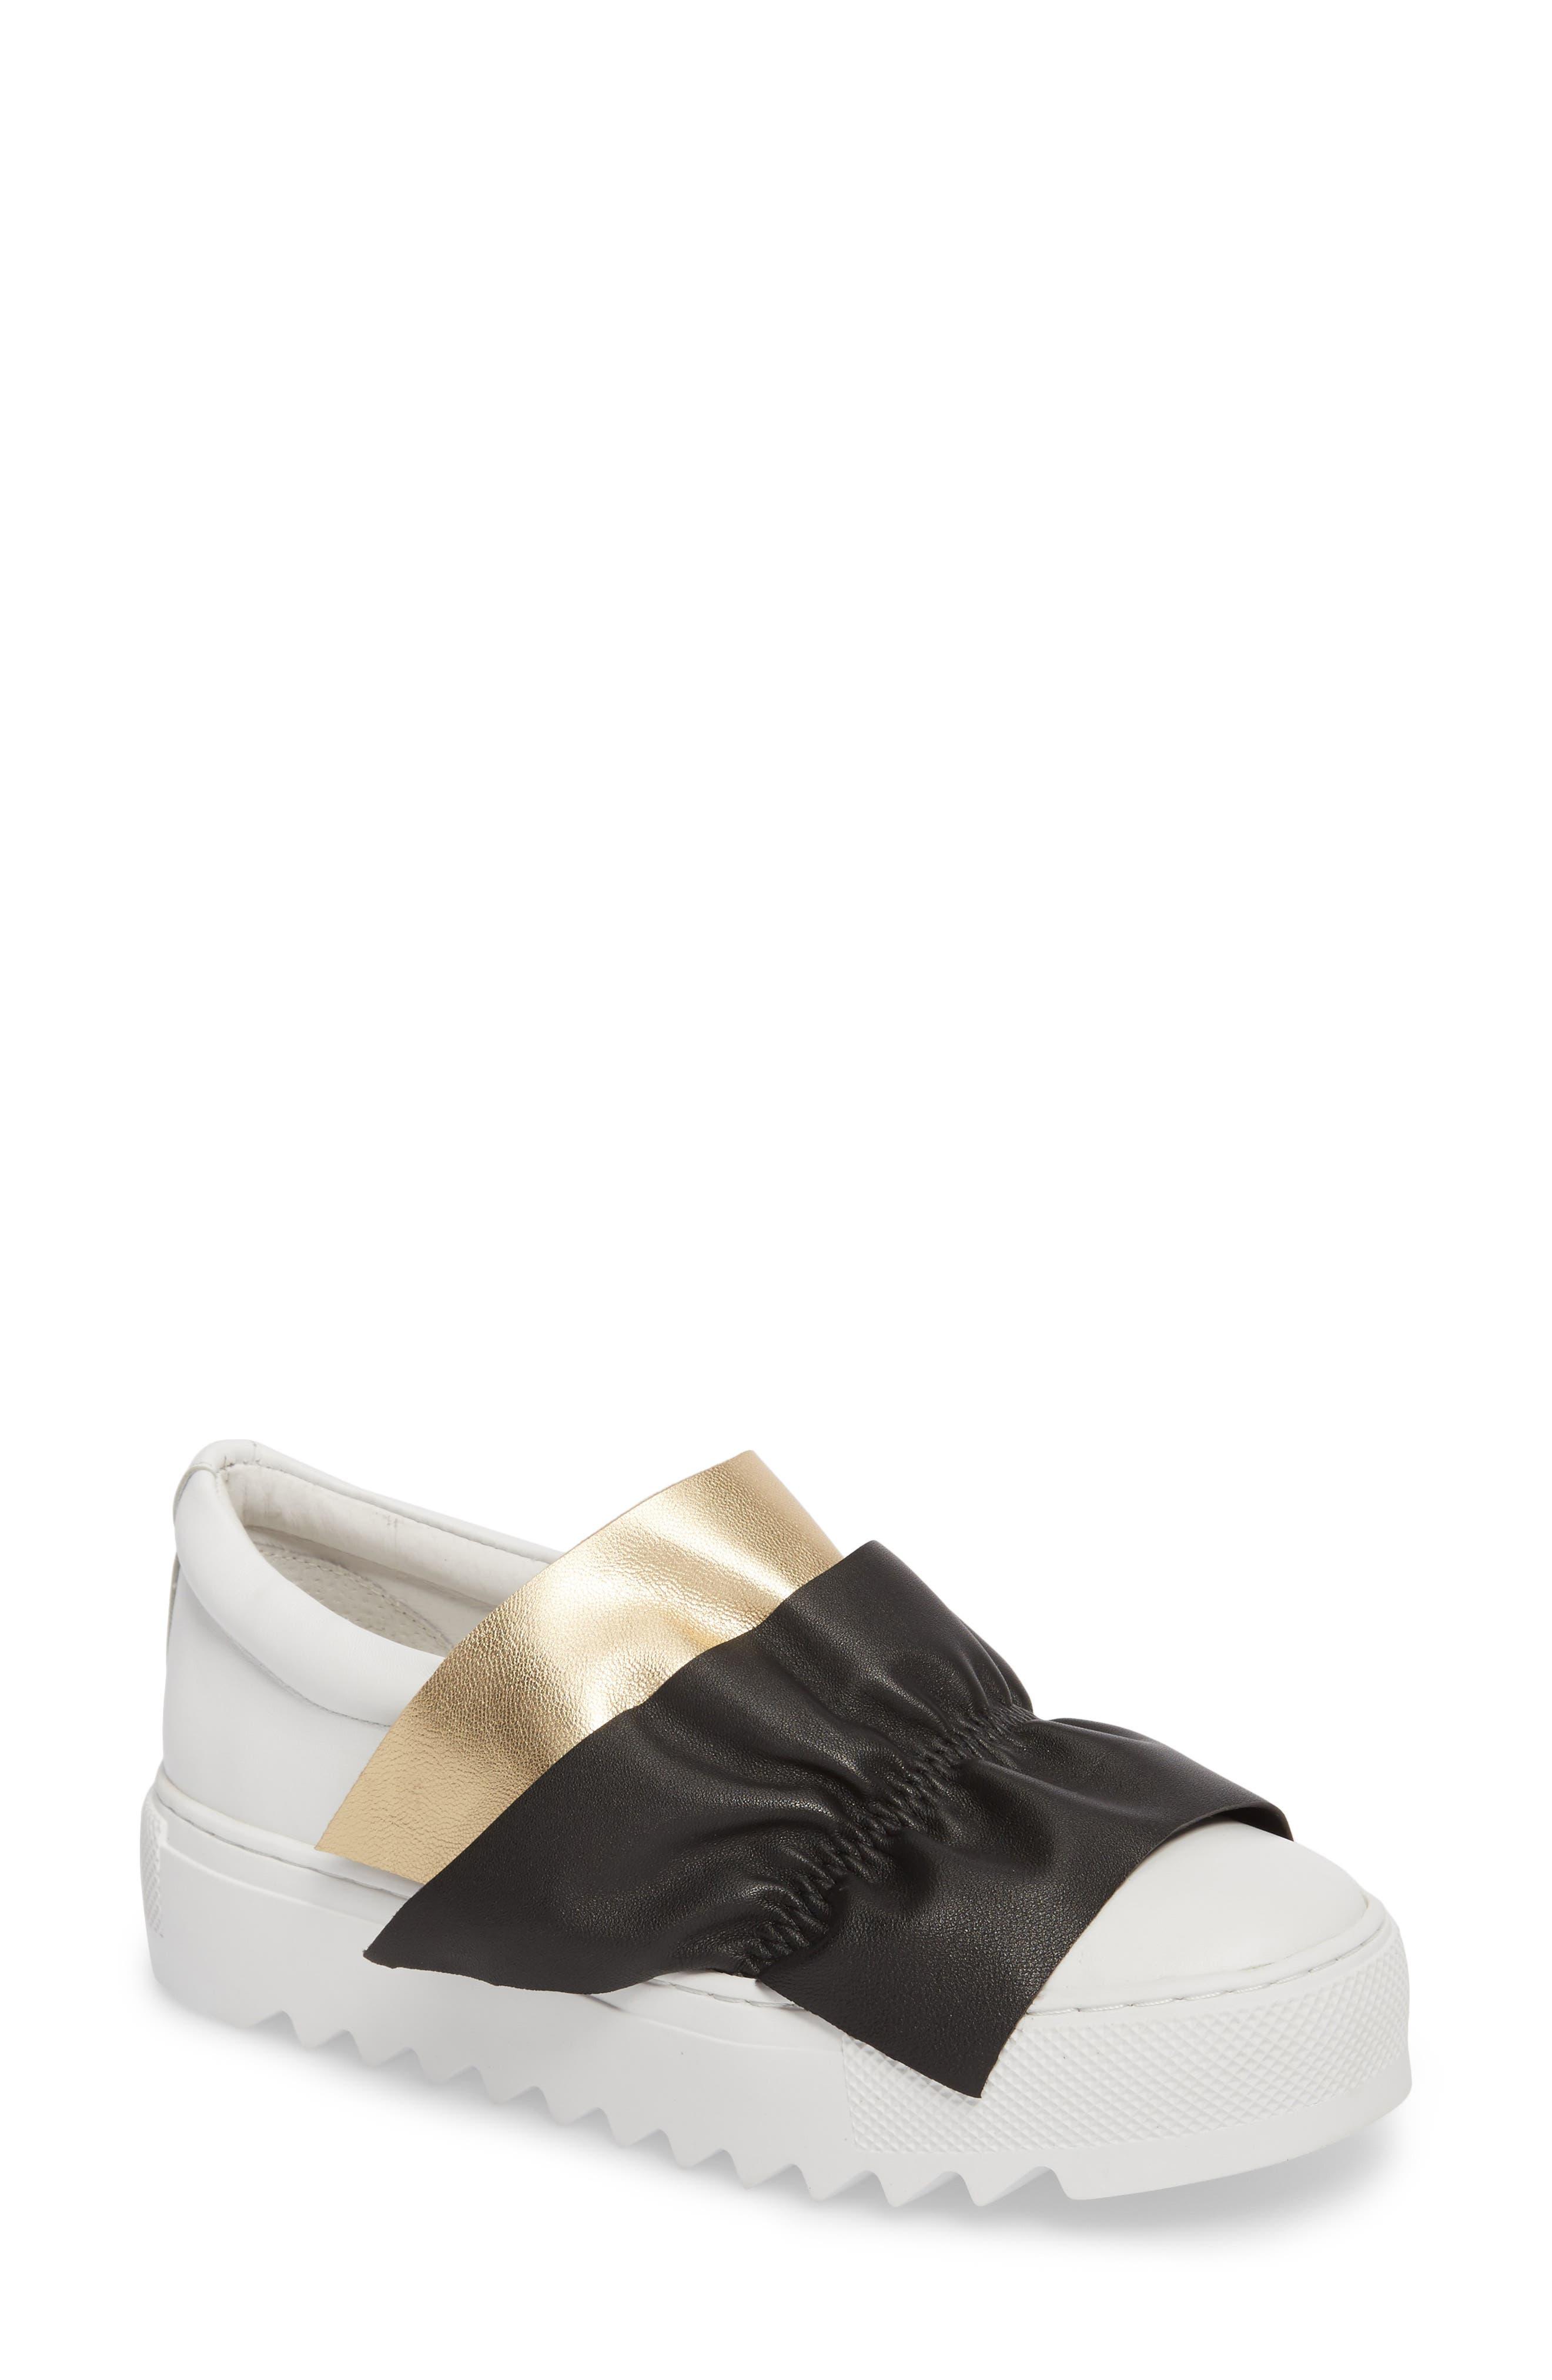 Sadie Ruffle Platform Sneaker,                             Main thumbnail 1, color,                             White Leather